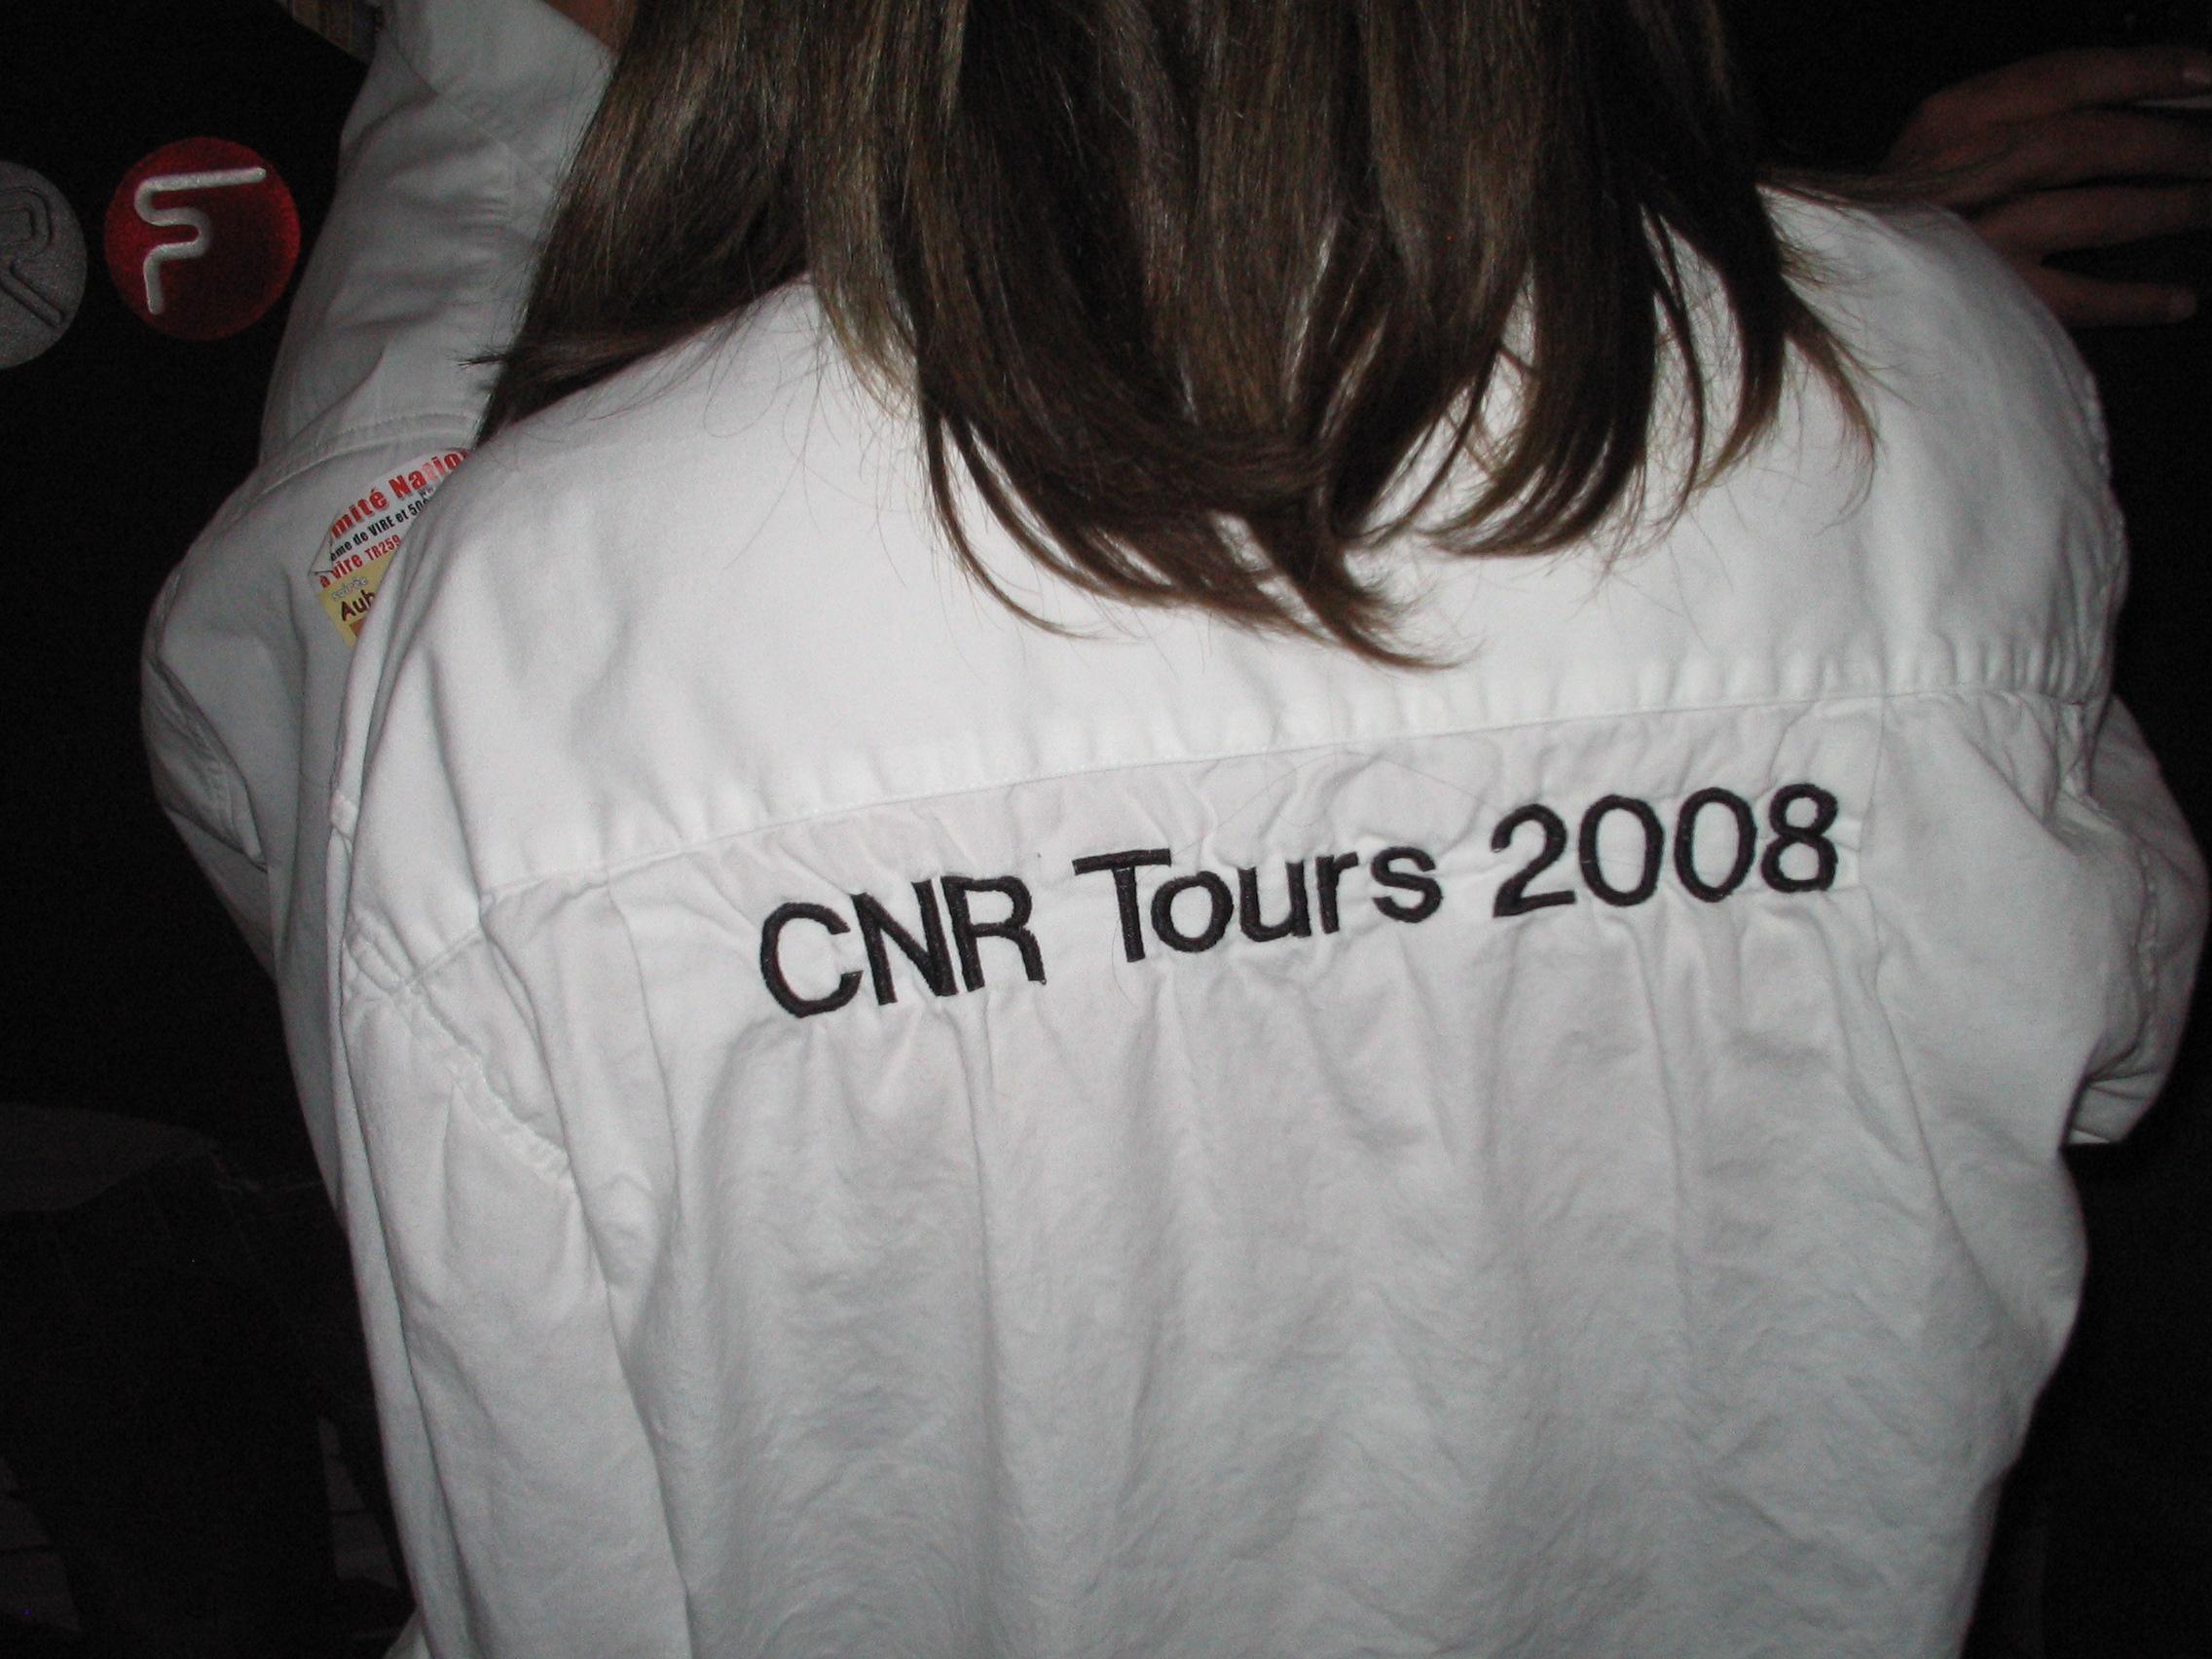 080118cnr2008tours6.jpg